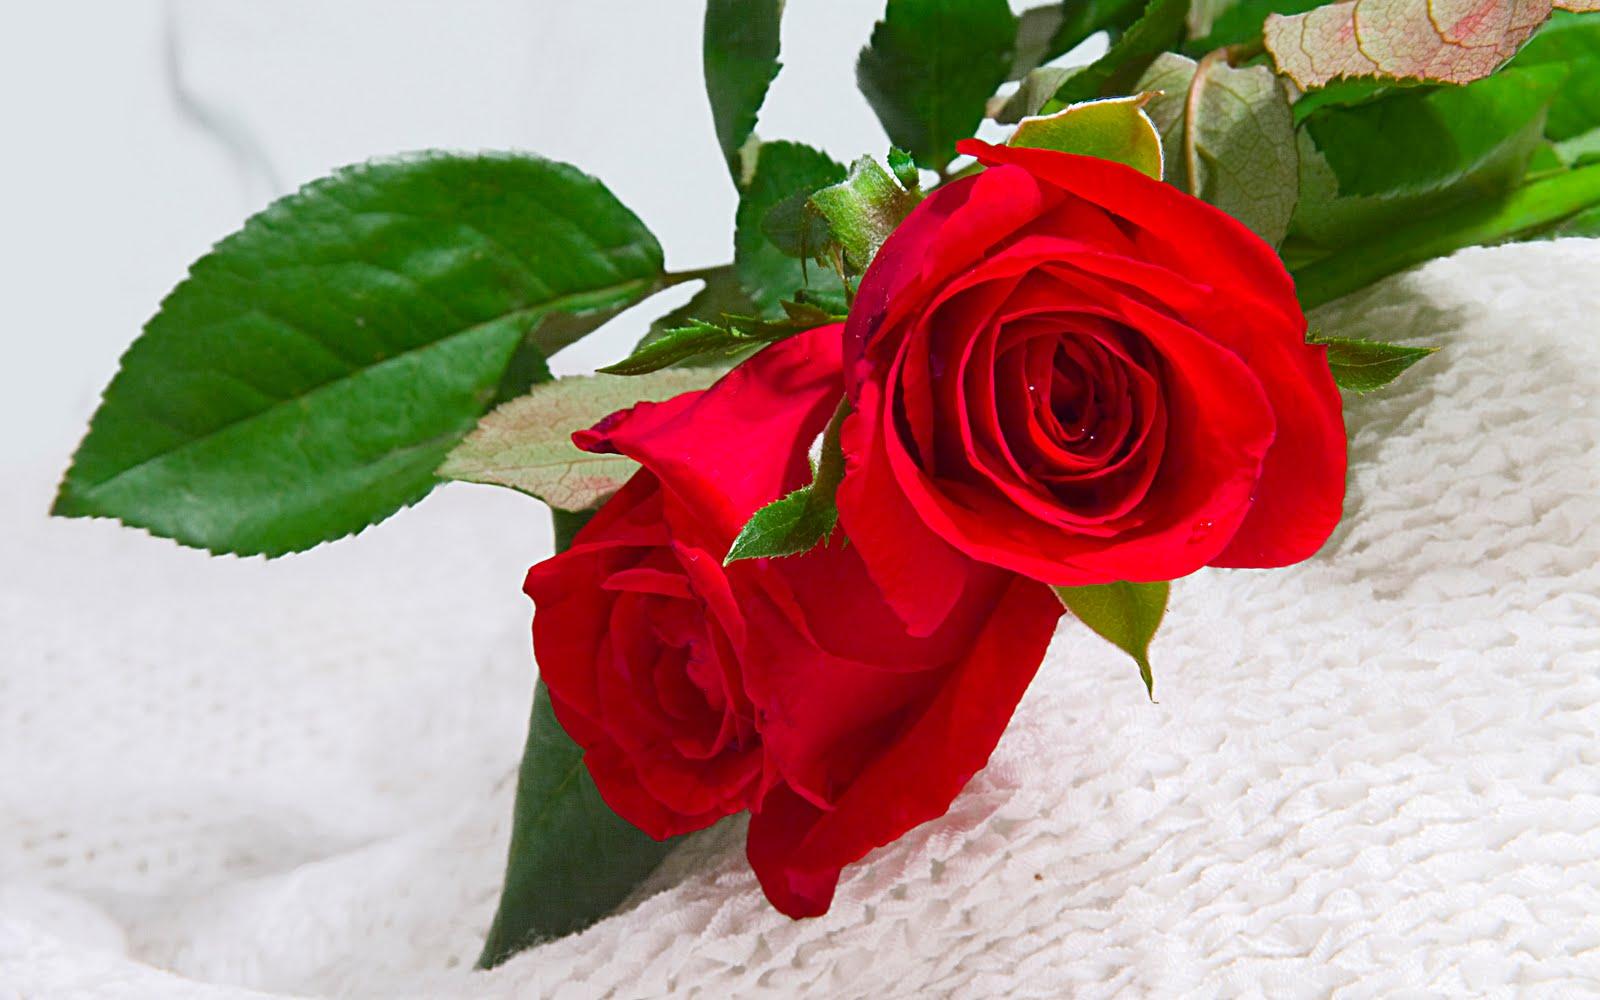 http://4.bp.blogspot.com/_2IU2Nt4rD1k/TBZkrmOxknI/AAAAAAAABss/DcKi6sJ2YFI/s1600/red_rose_wallpaper.jpg